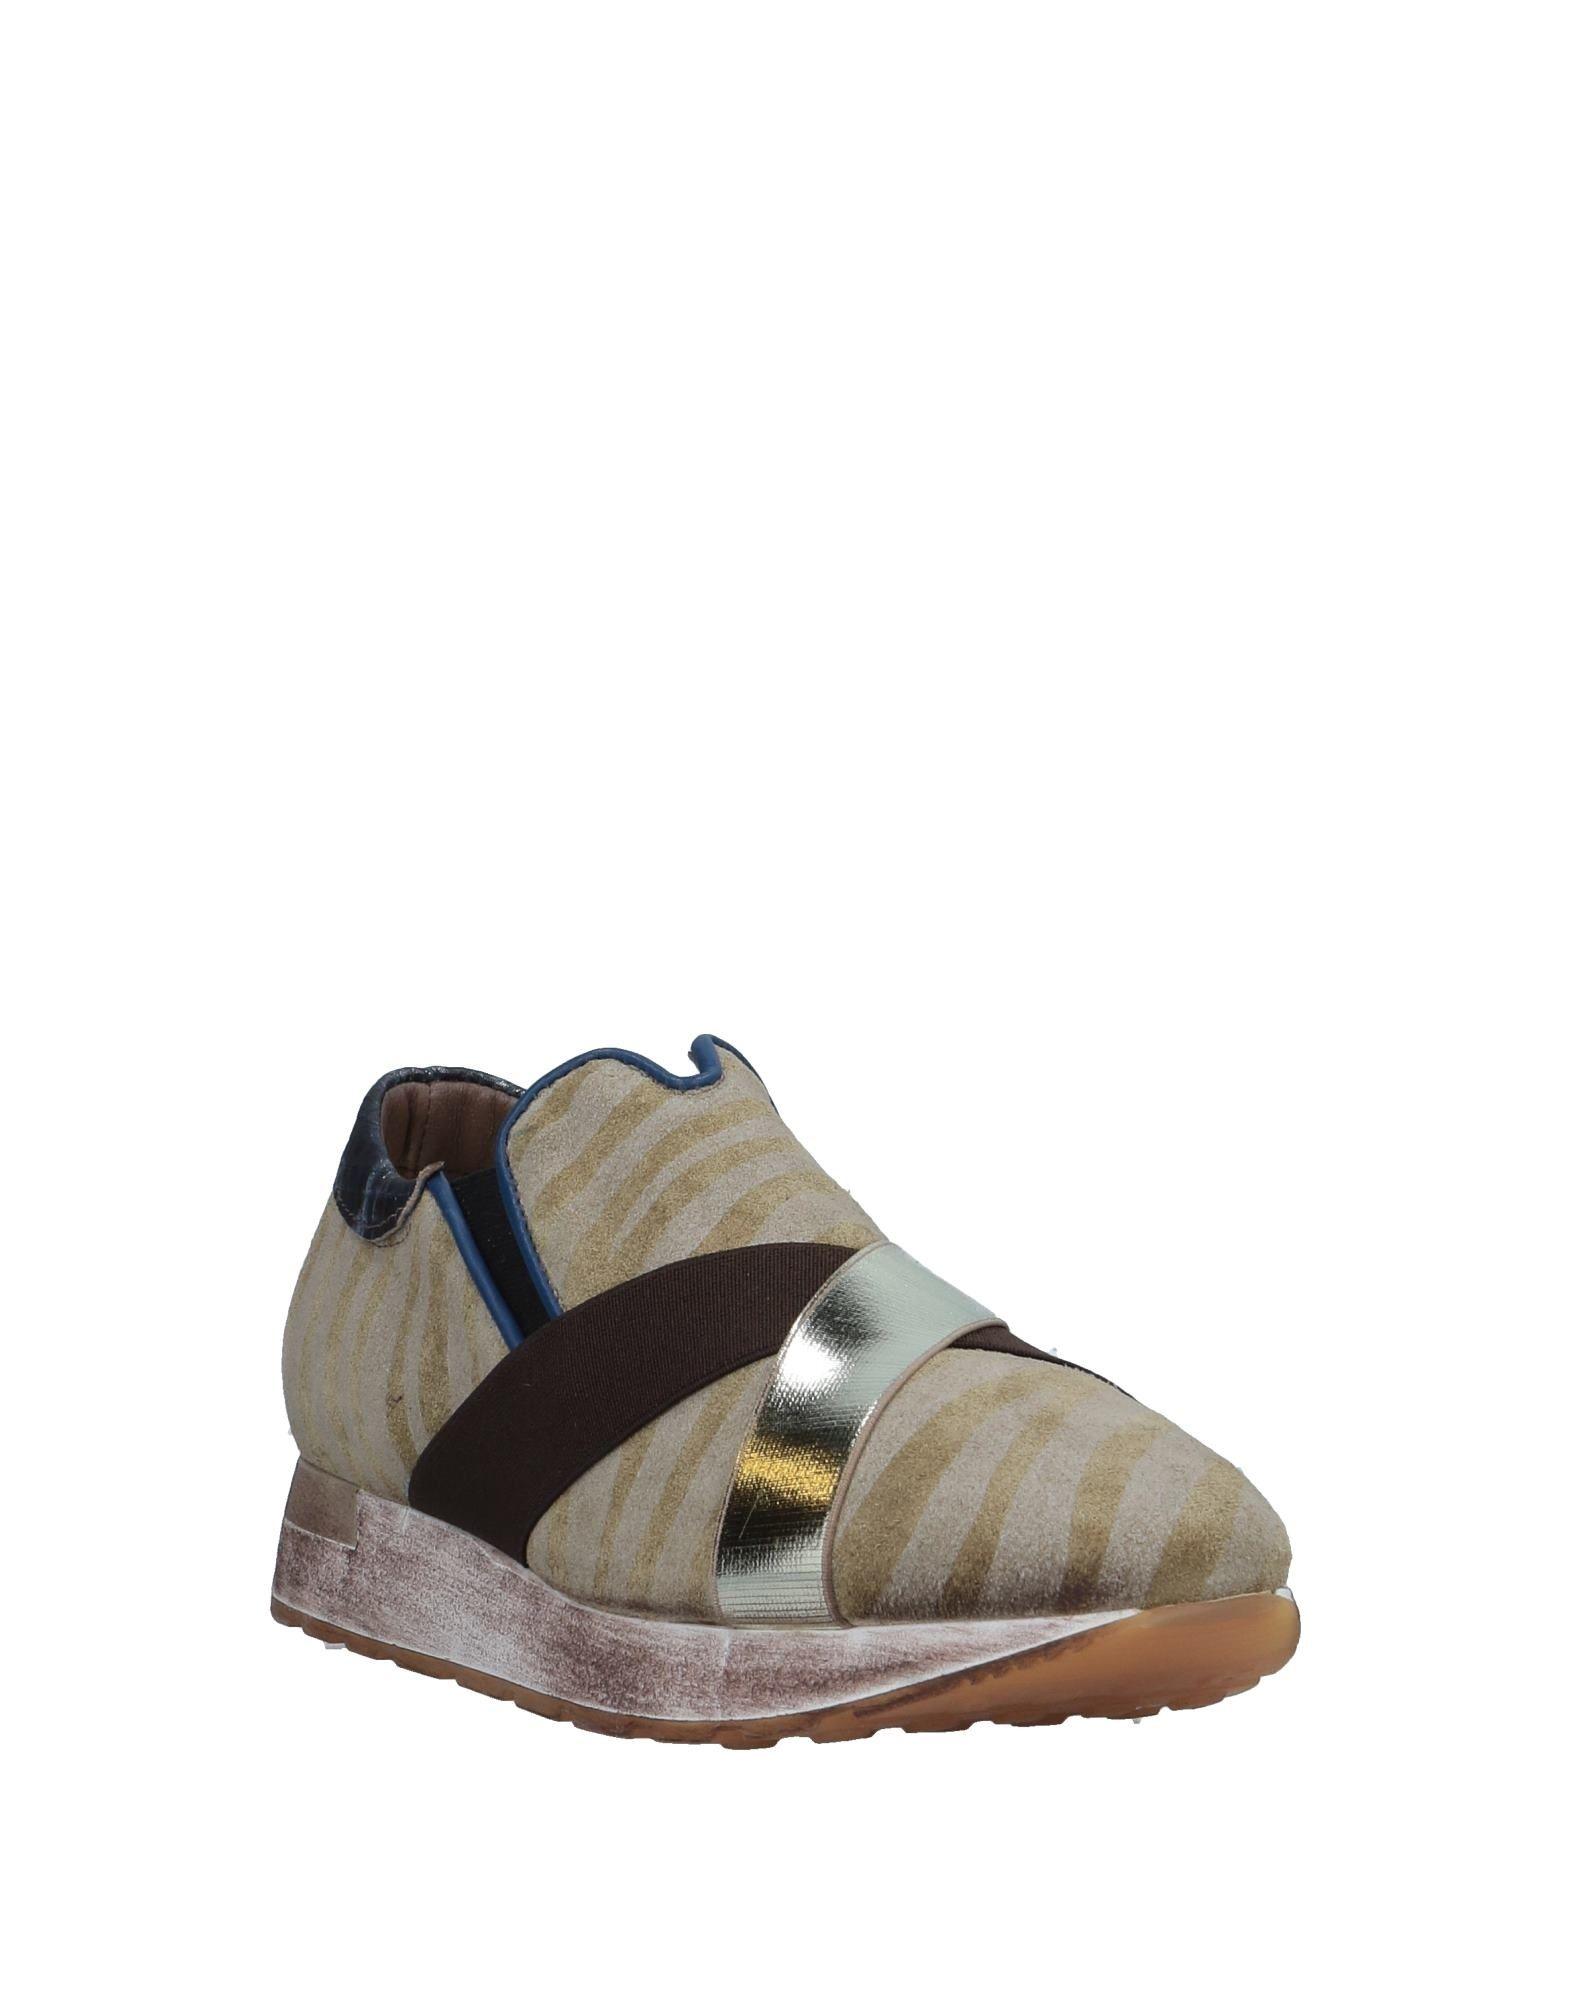 Ebarrito Sneakers Damen  11532952FS Schuhe Gute Qualität beliebte Schuhe 11532952FS 809742